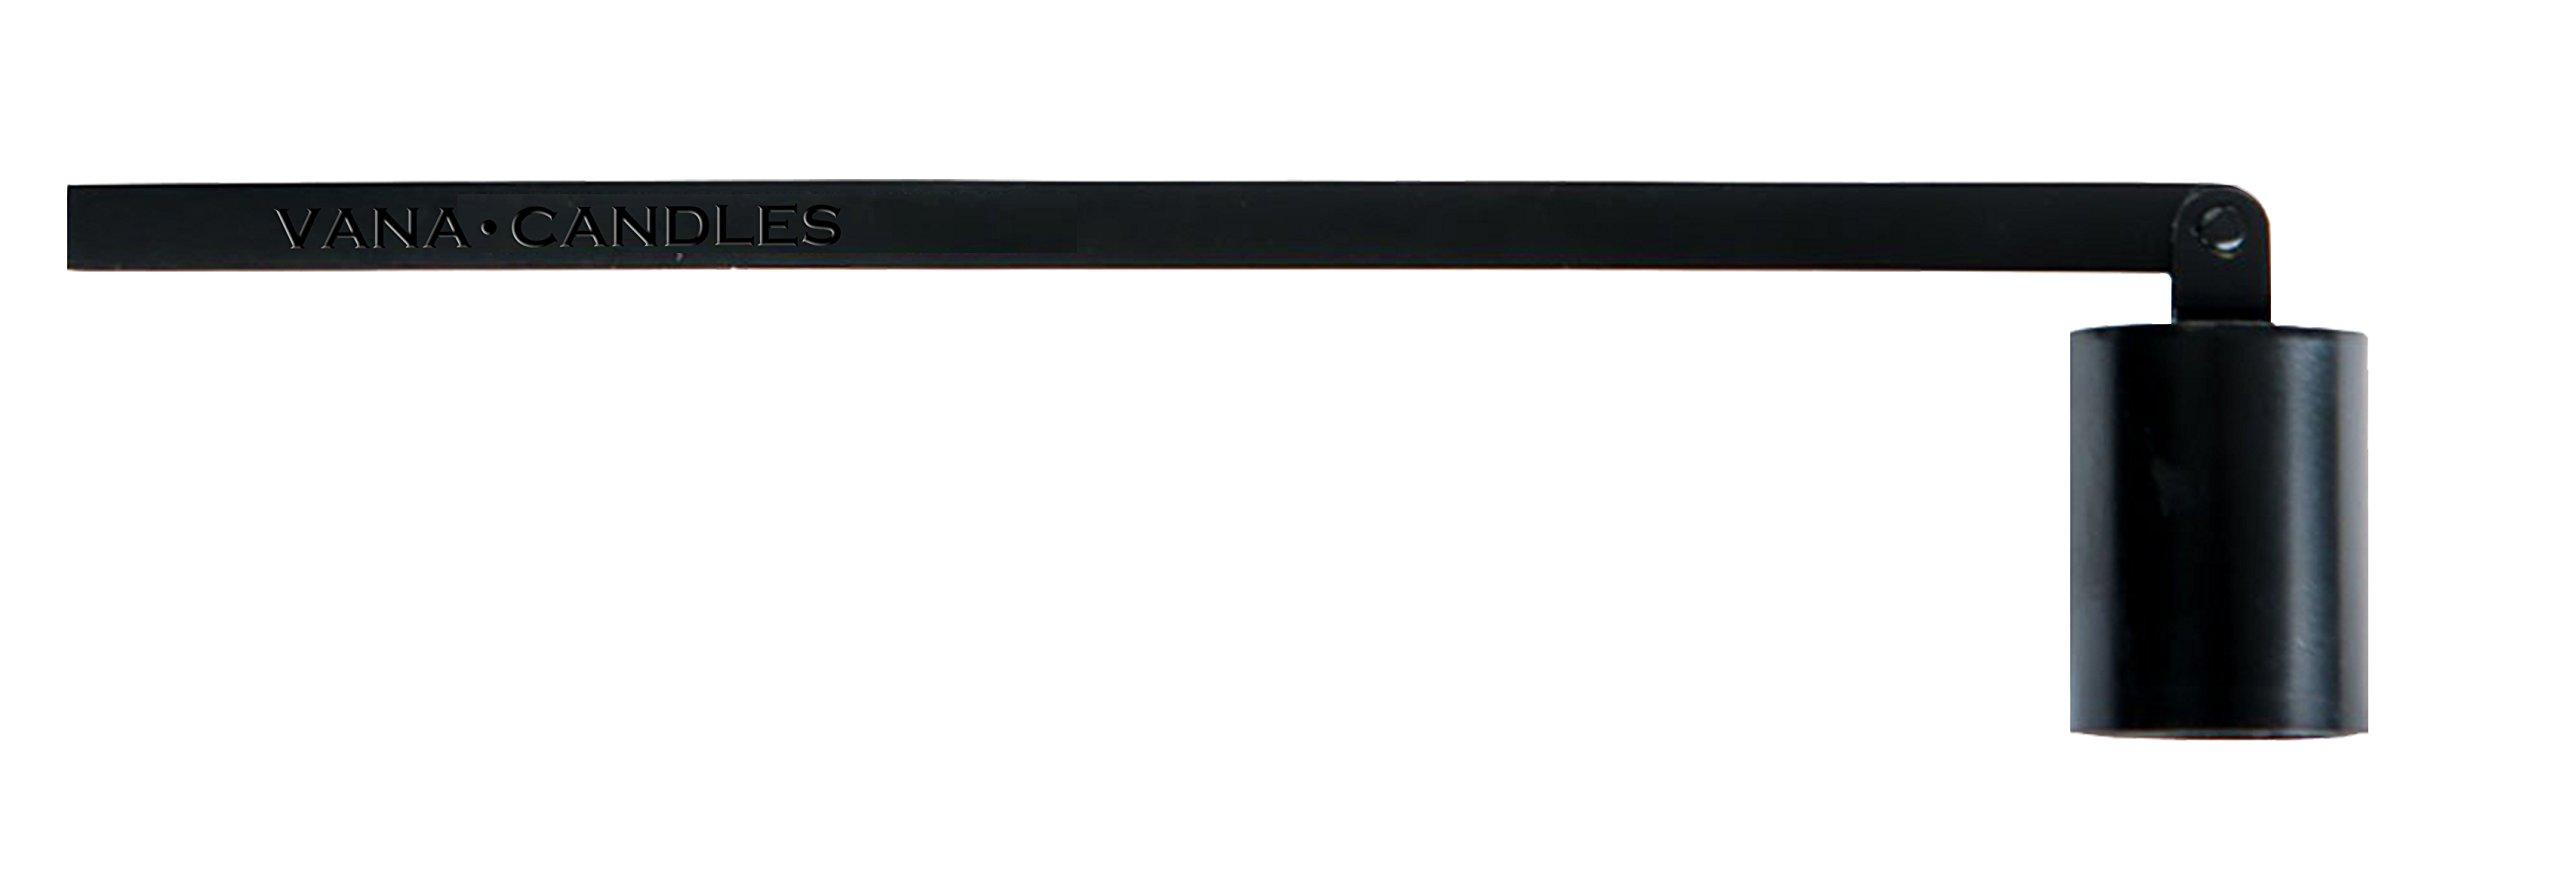 Vana Candles Swedish Design - Snuffer, Matte Black